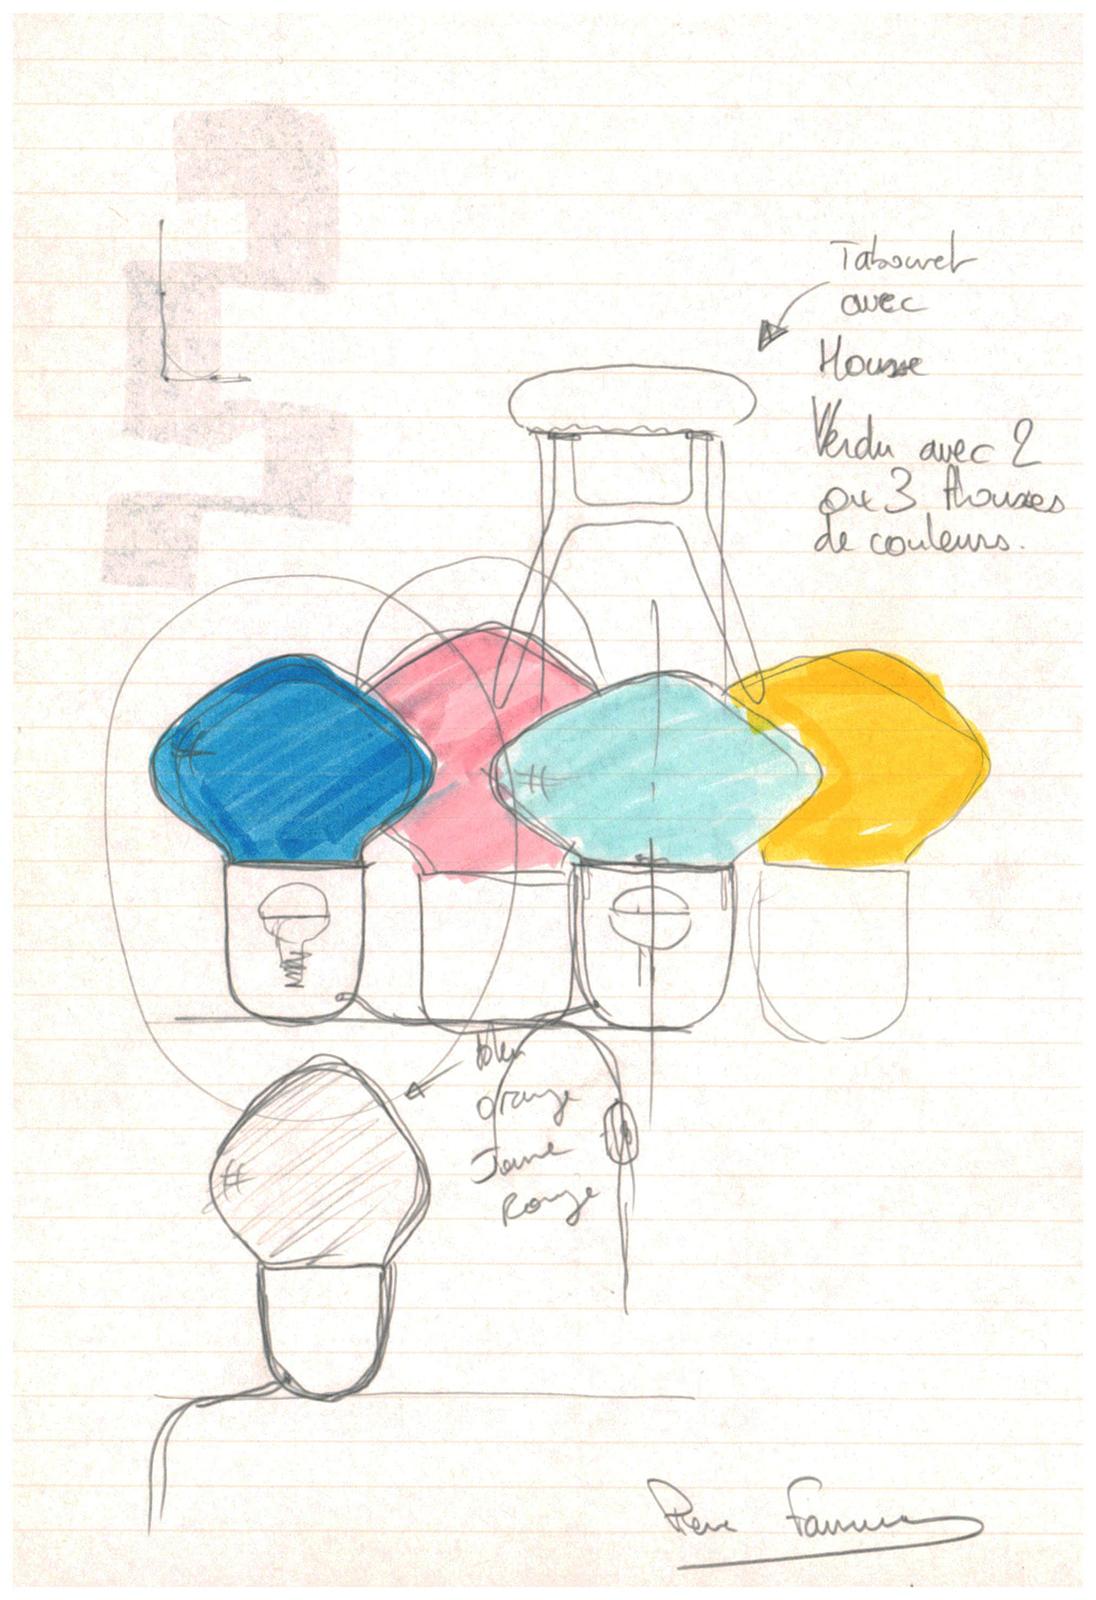 Pierre Favresse - Work - Drawing - Designer - Design - Preparatory sketch n°3